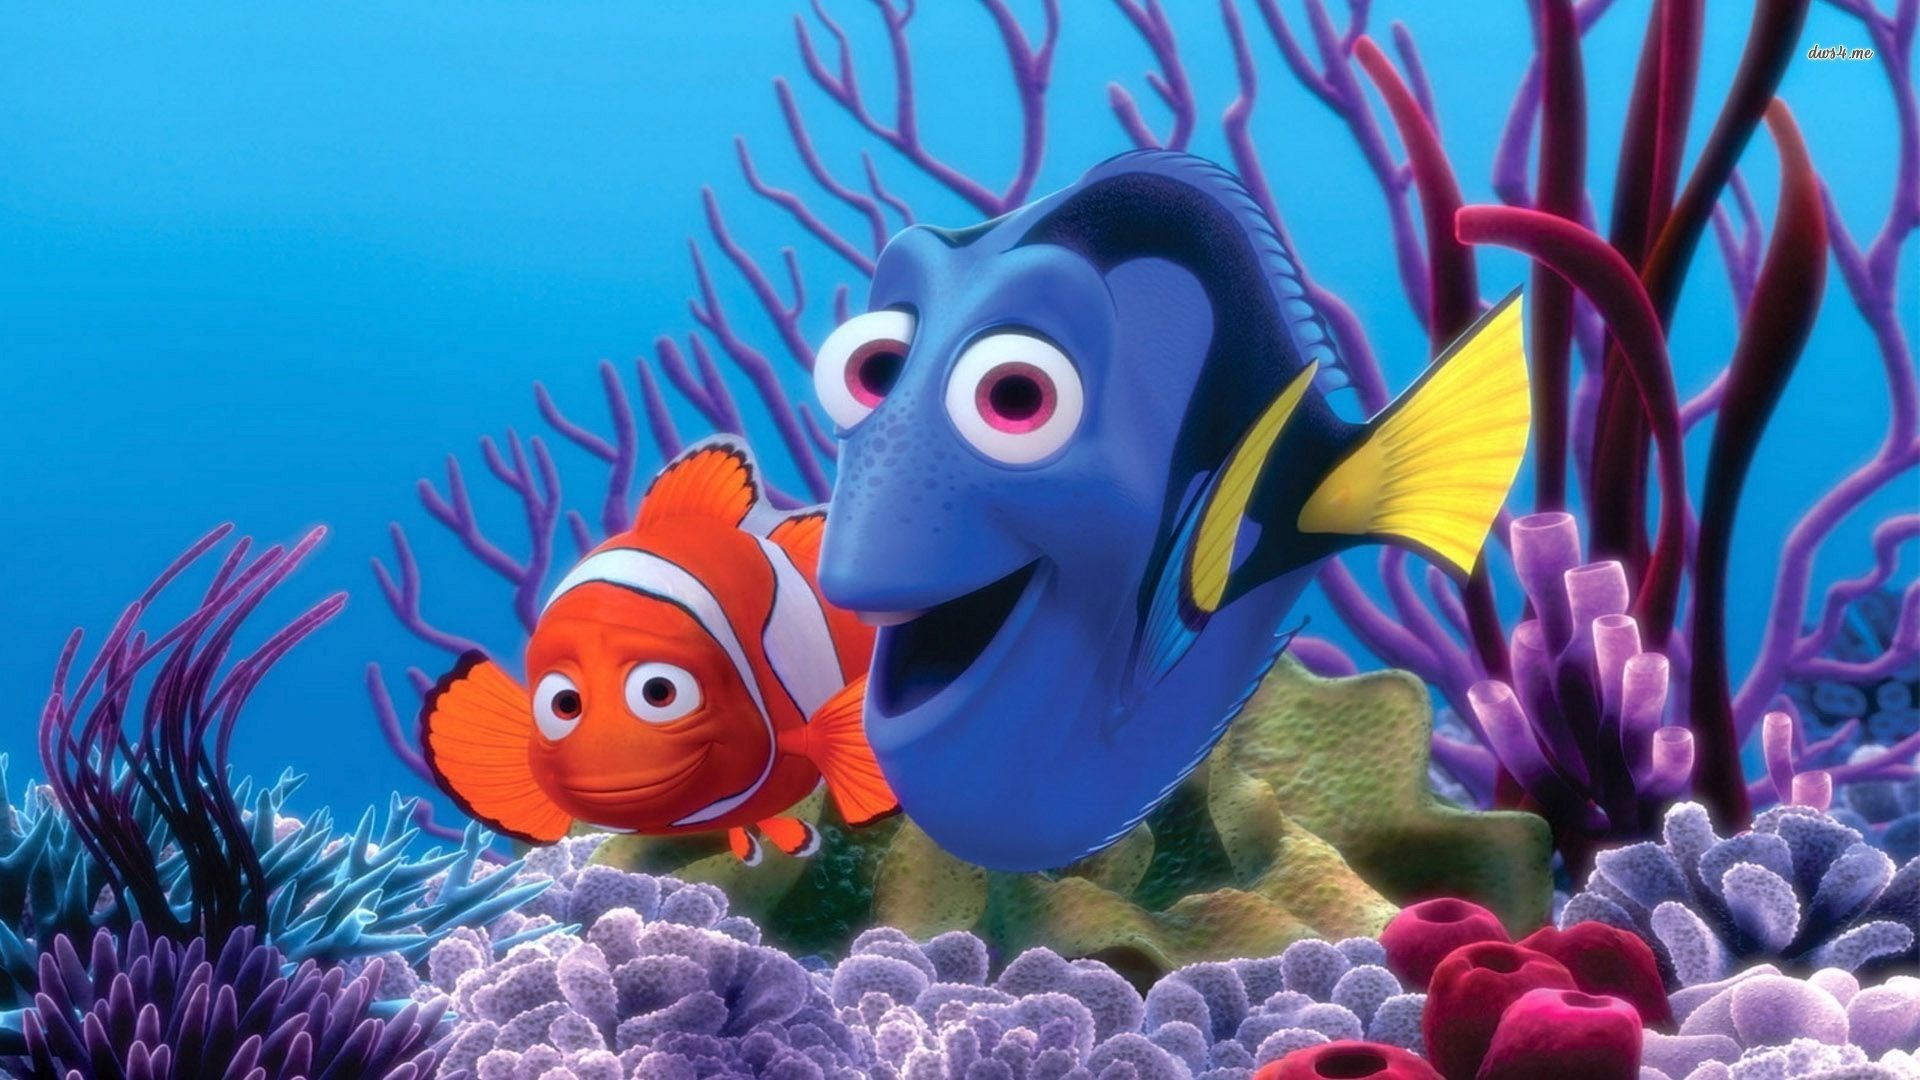 23 Finding Nemo Wallpapers